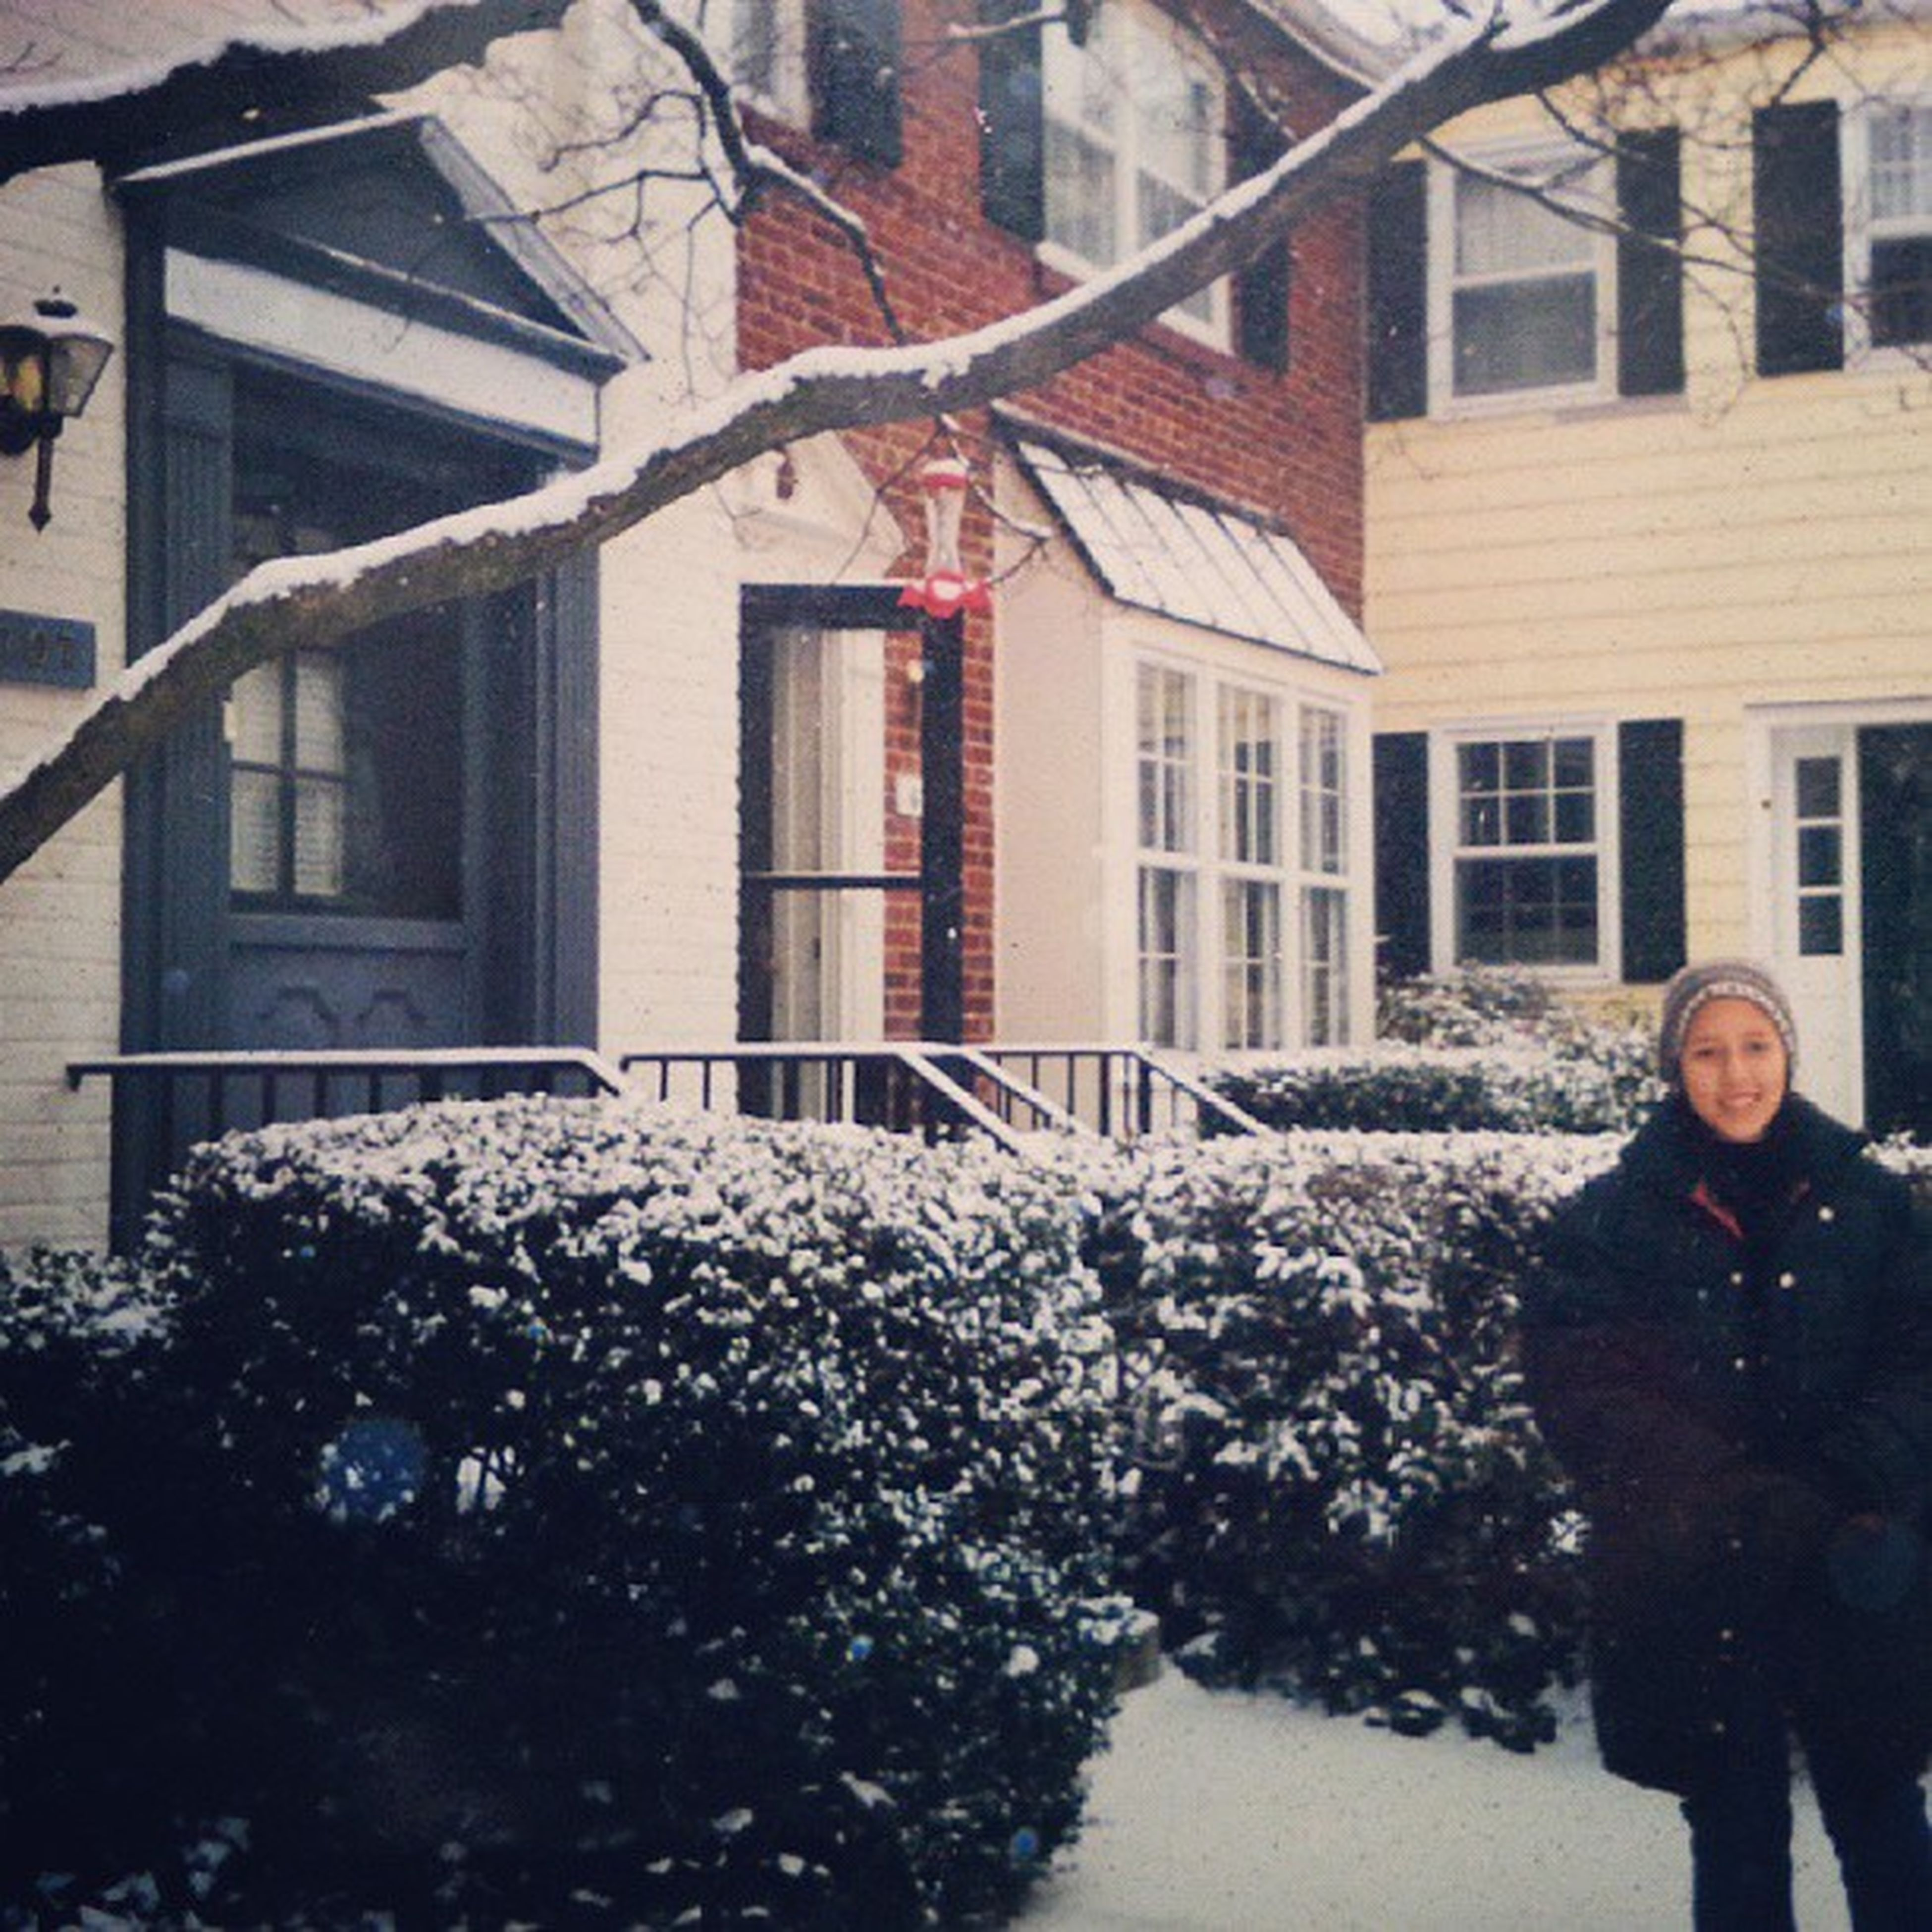 Dianix8800 en Washington Meryland Instaphoto pics picture instagood travel igtravel winter cold ⛄ ⛄